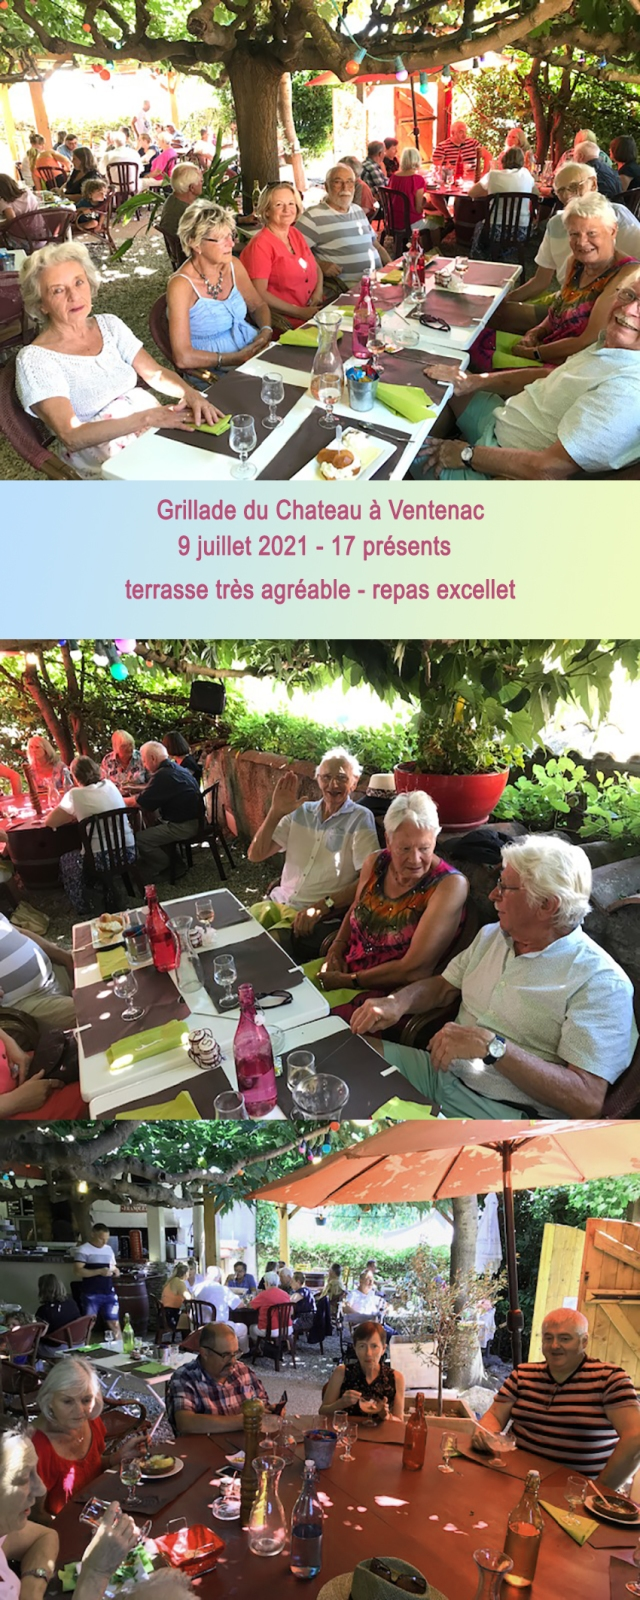 210709 Grillade Chateau